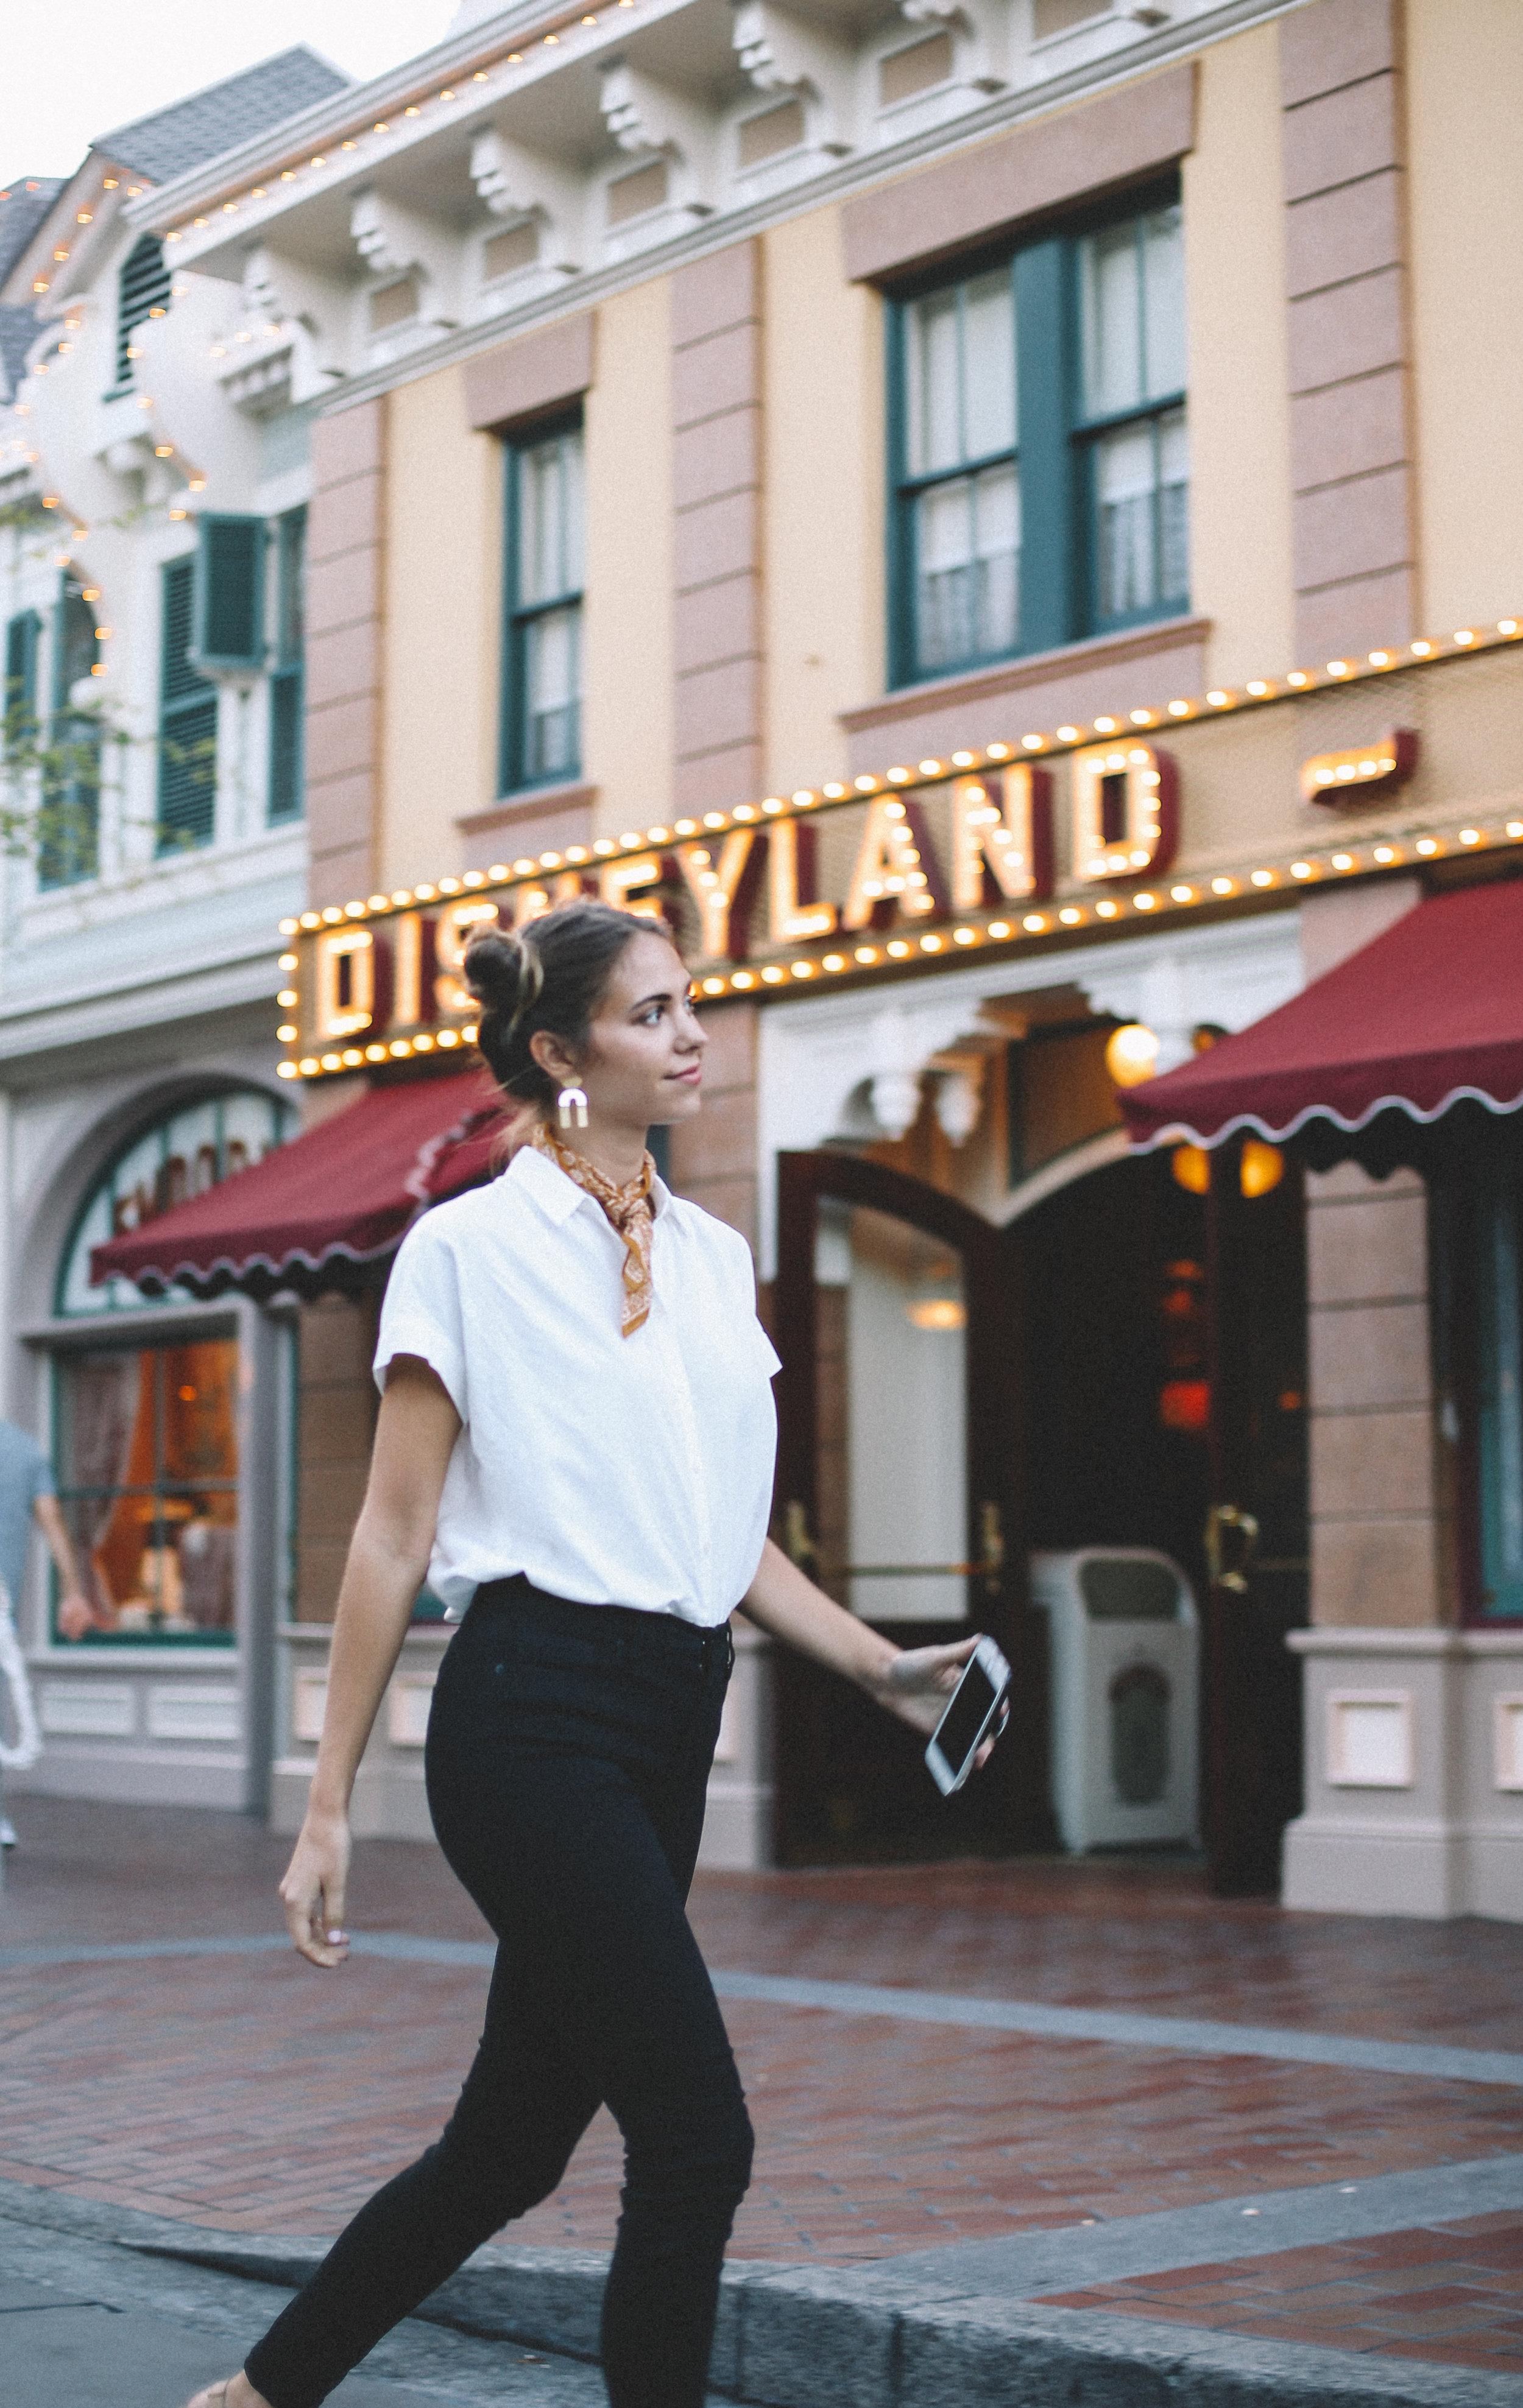 Disneyland-17.jpg